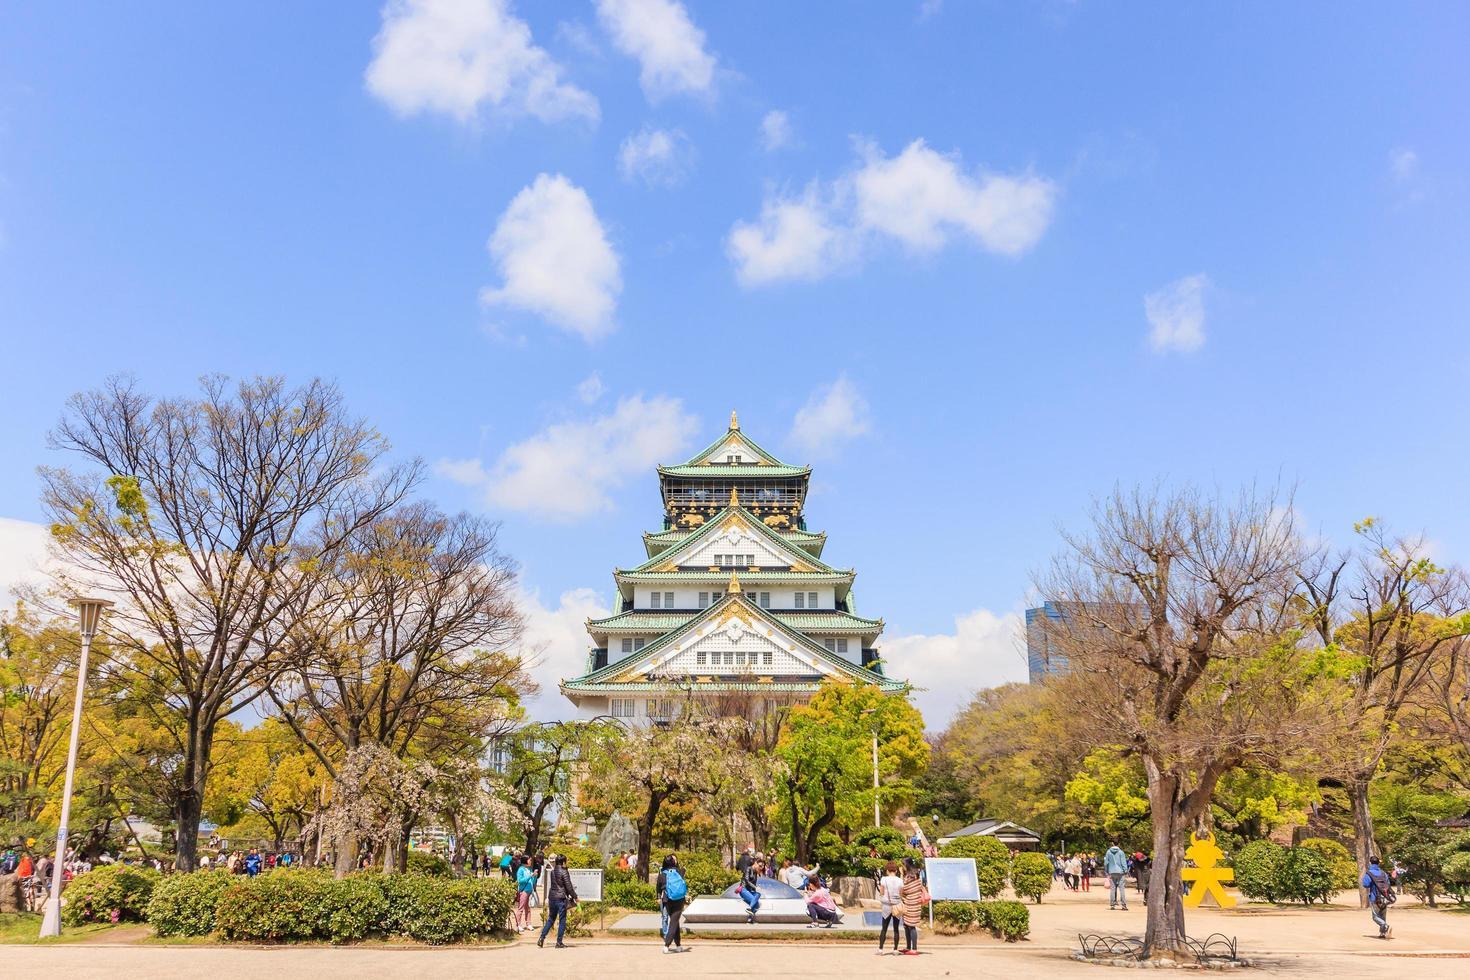 osaka kasteel in osaka, japan, 2015 foto